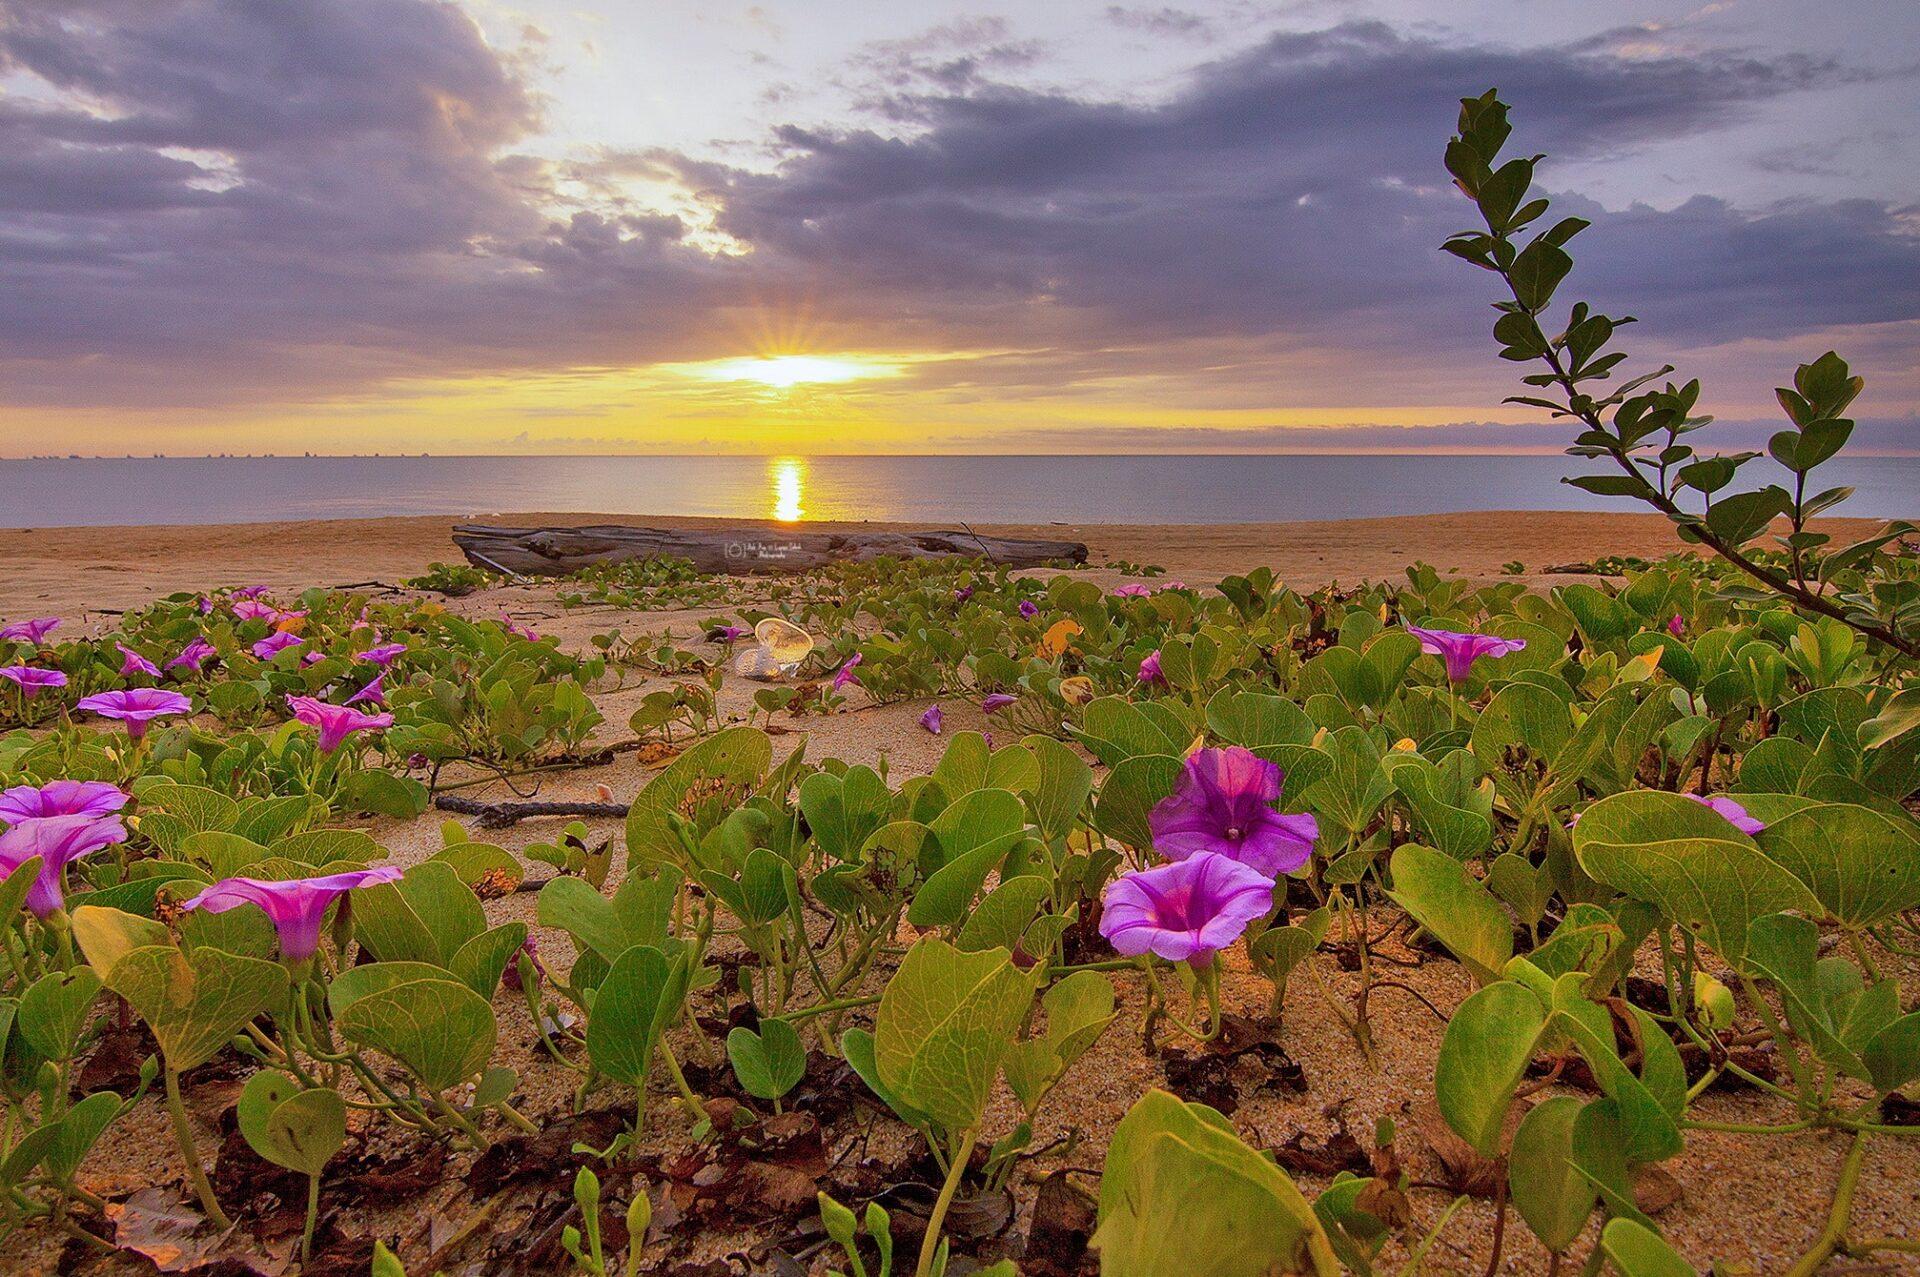 vot morning glory beach